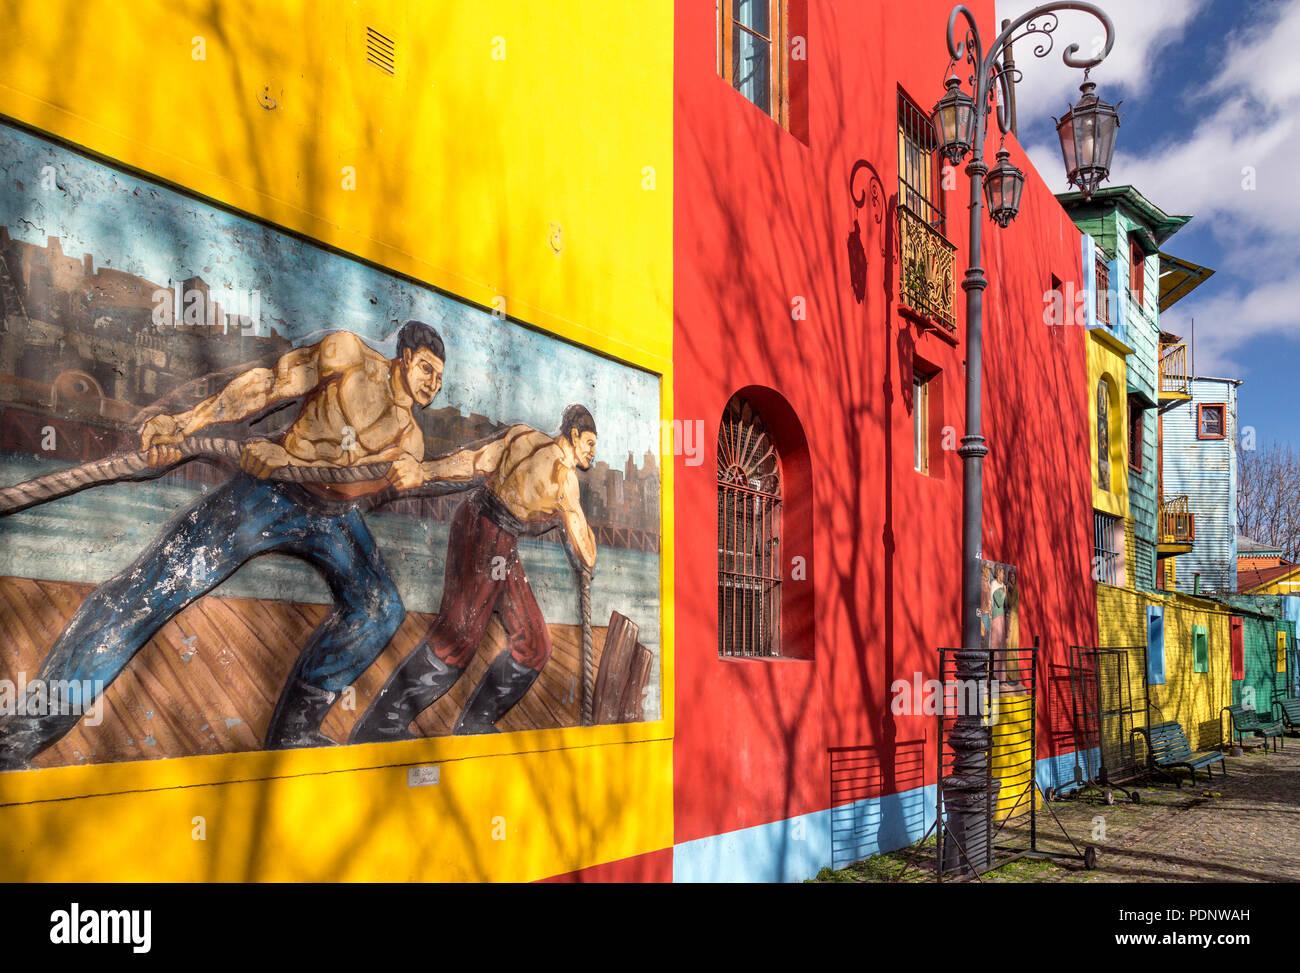 Caminito. La Boca, Buenos Aires, Argentinien Stockbild